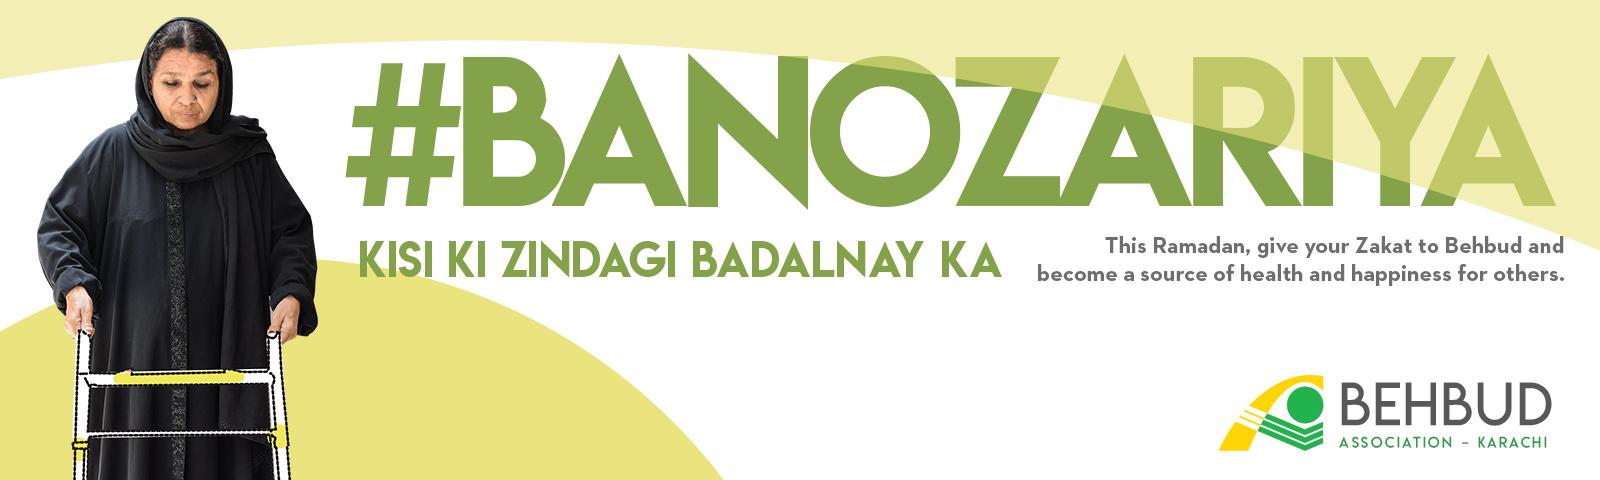 banozariya-ramadan-banner3